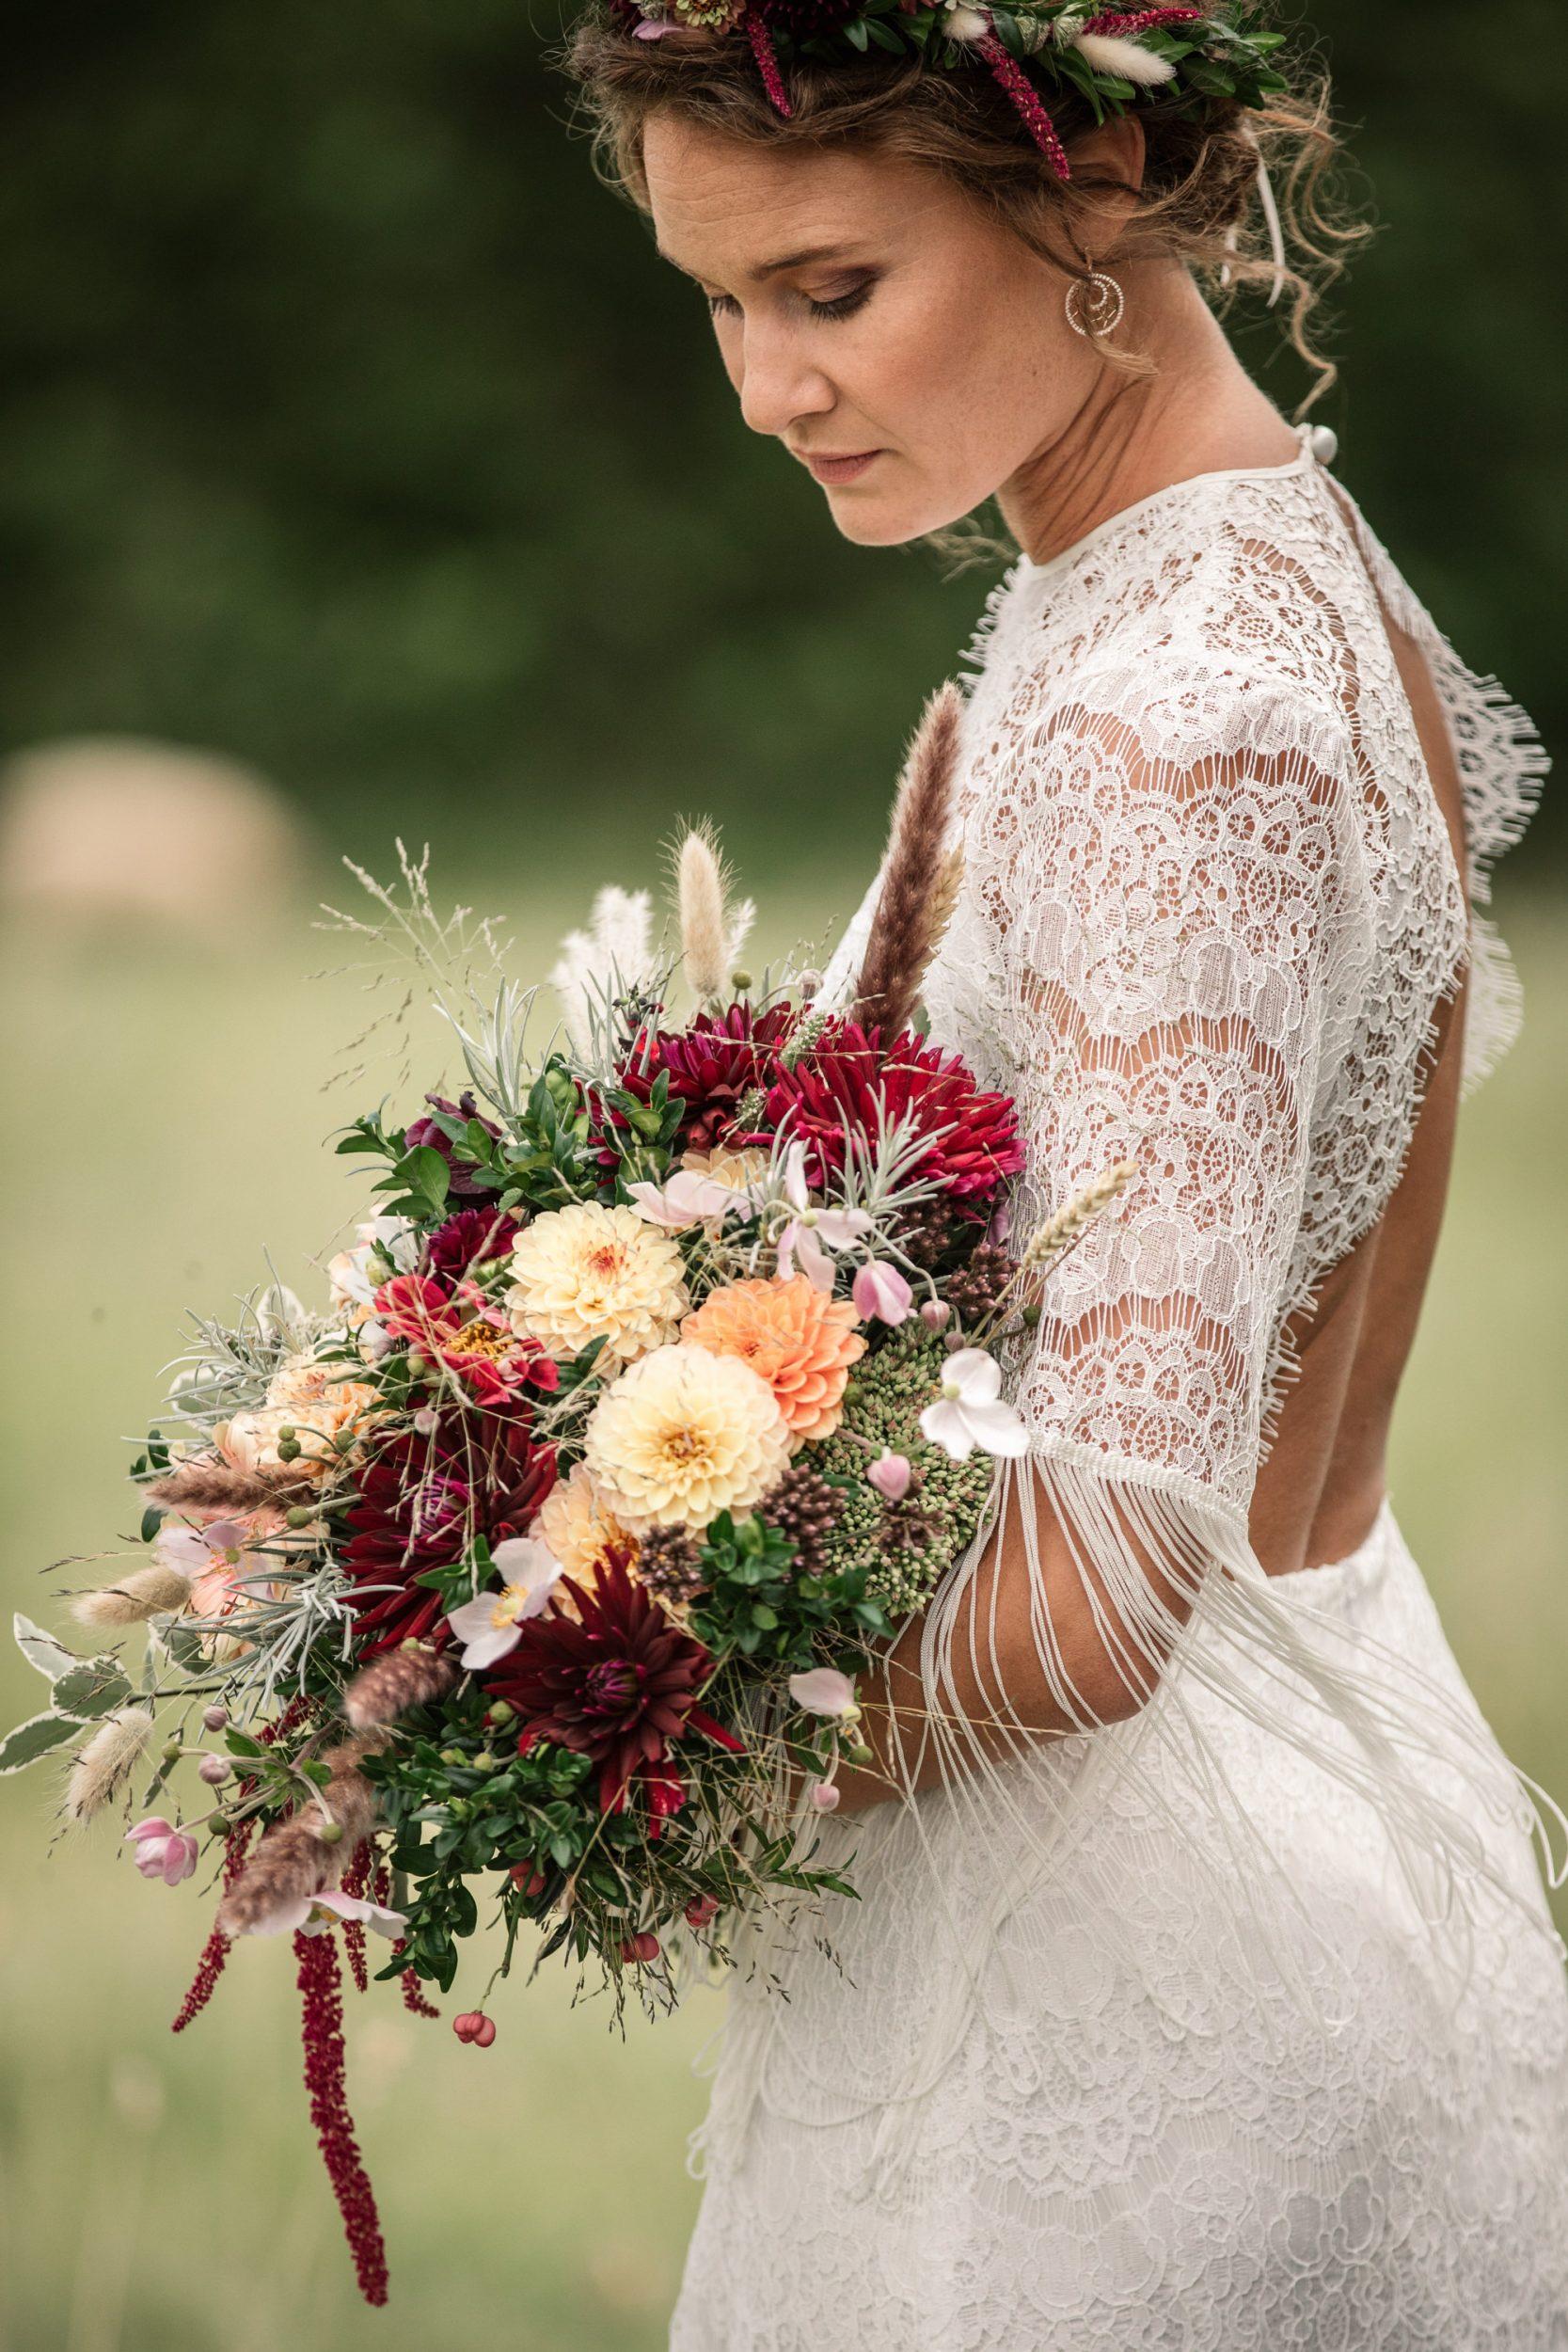 Bridal Bouquet for Suffolk Barn Wedding Photographer